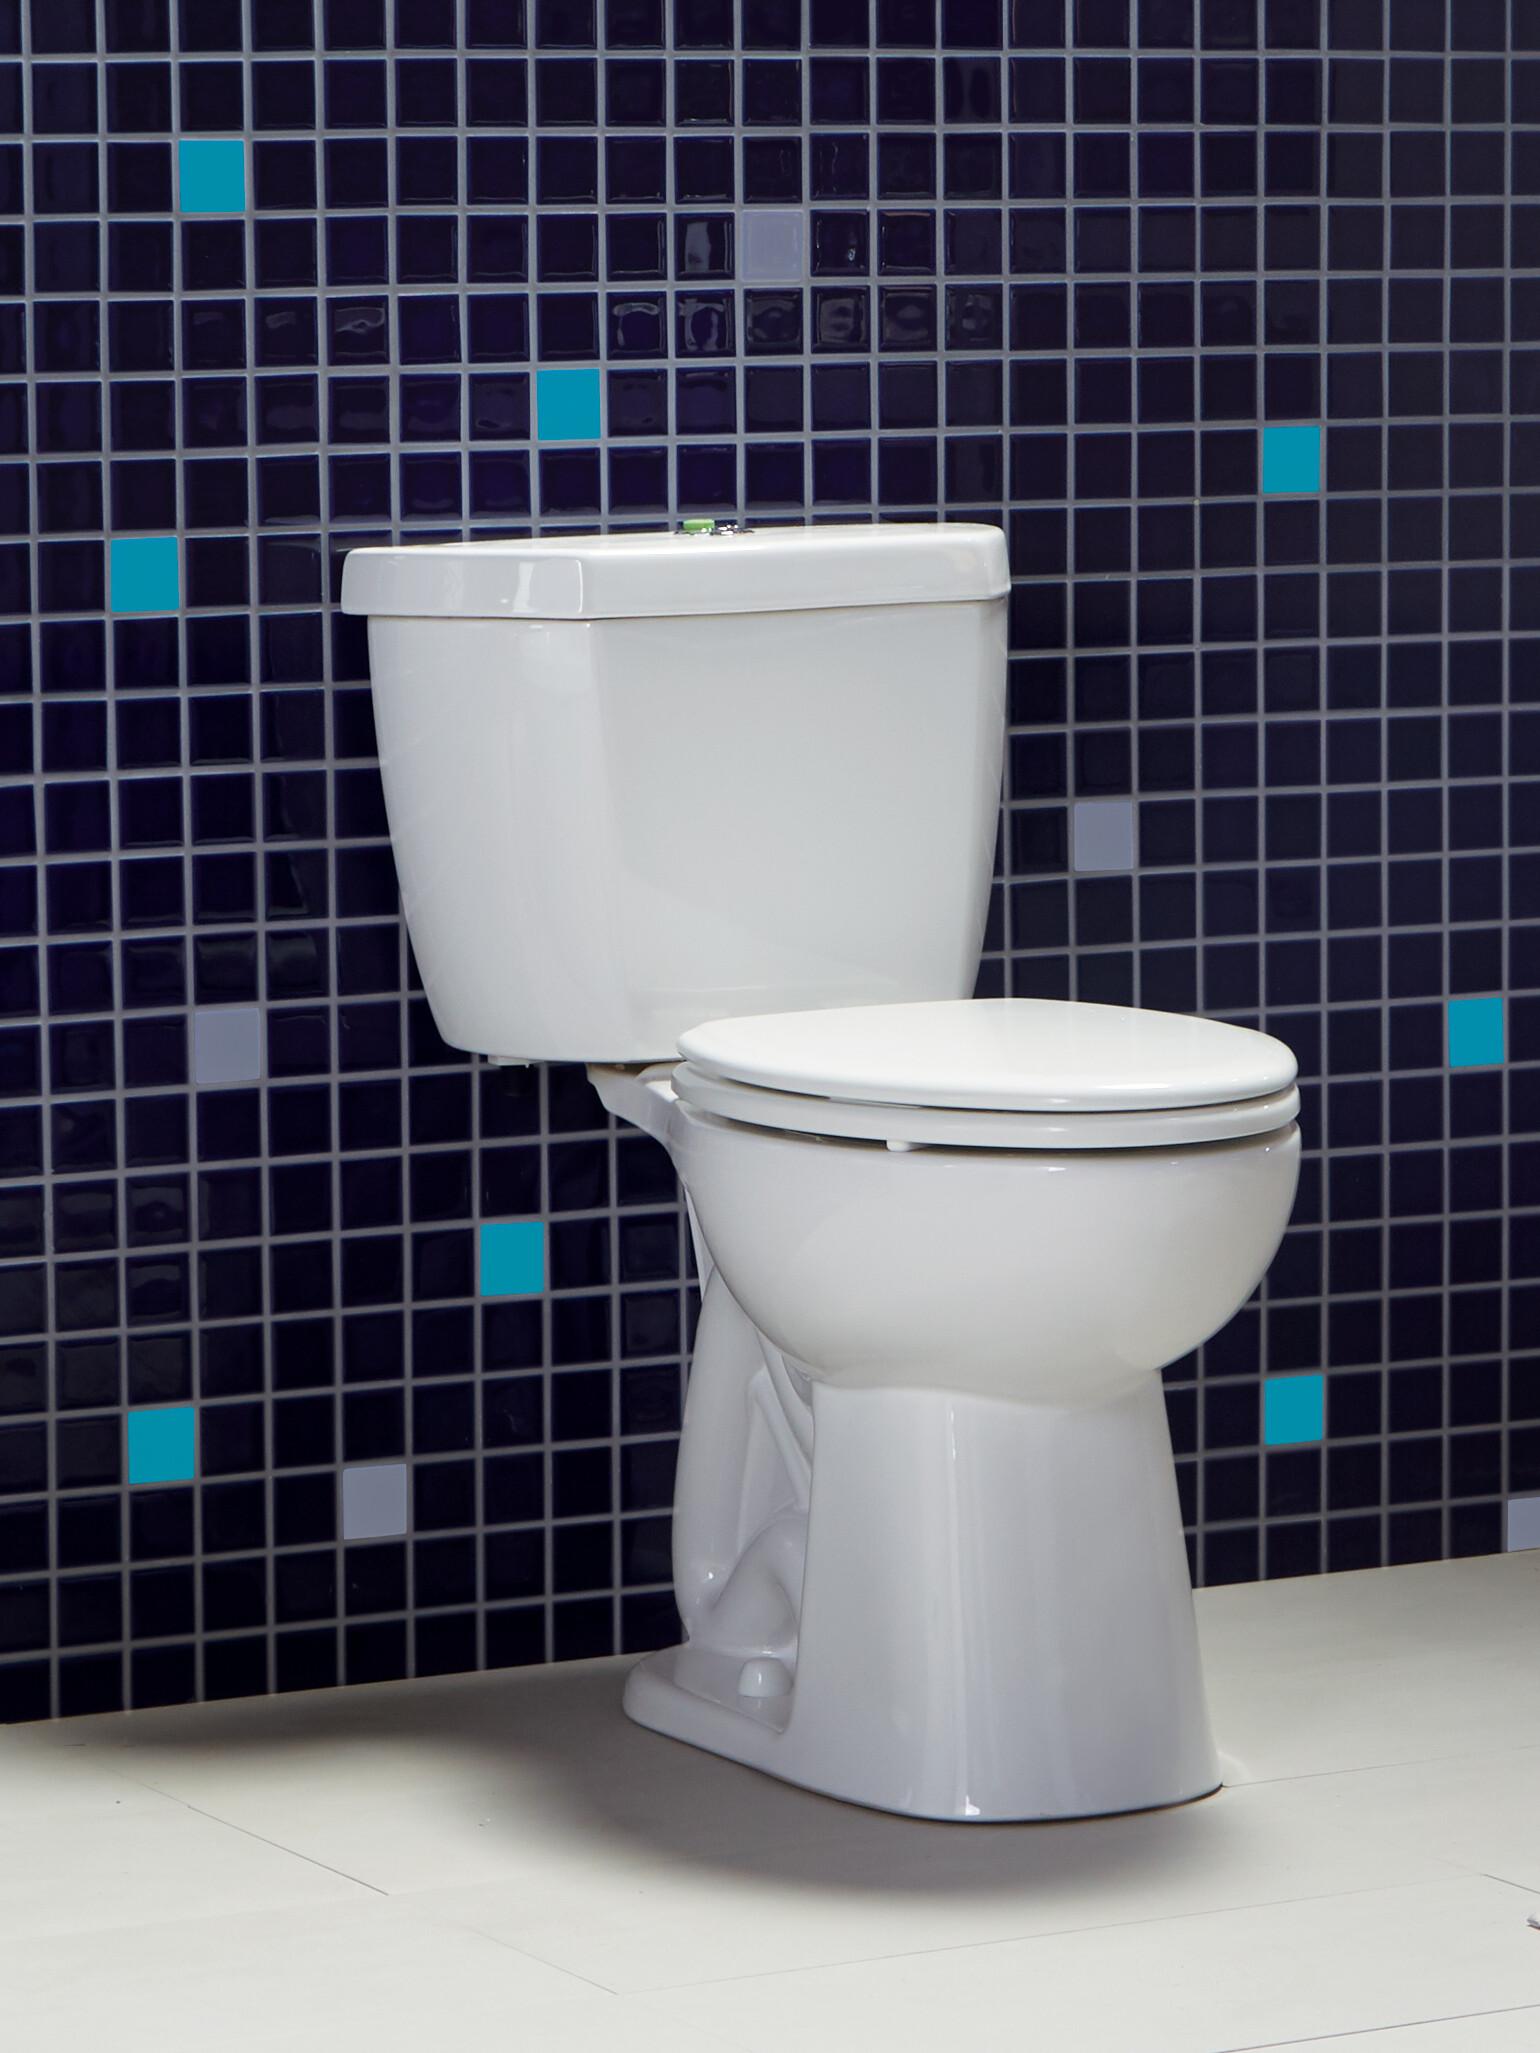 Original Stealth Dual Flush toilet